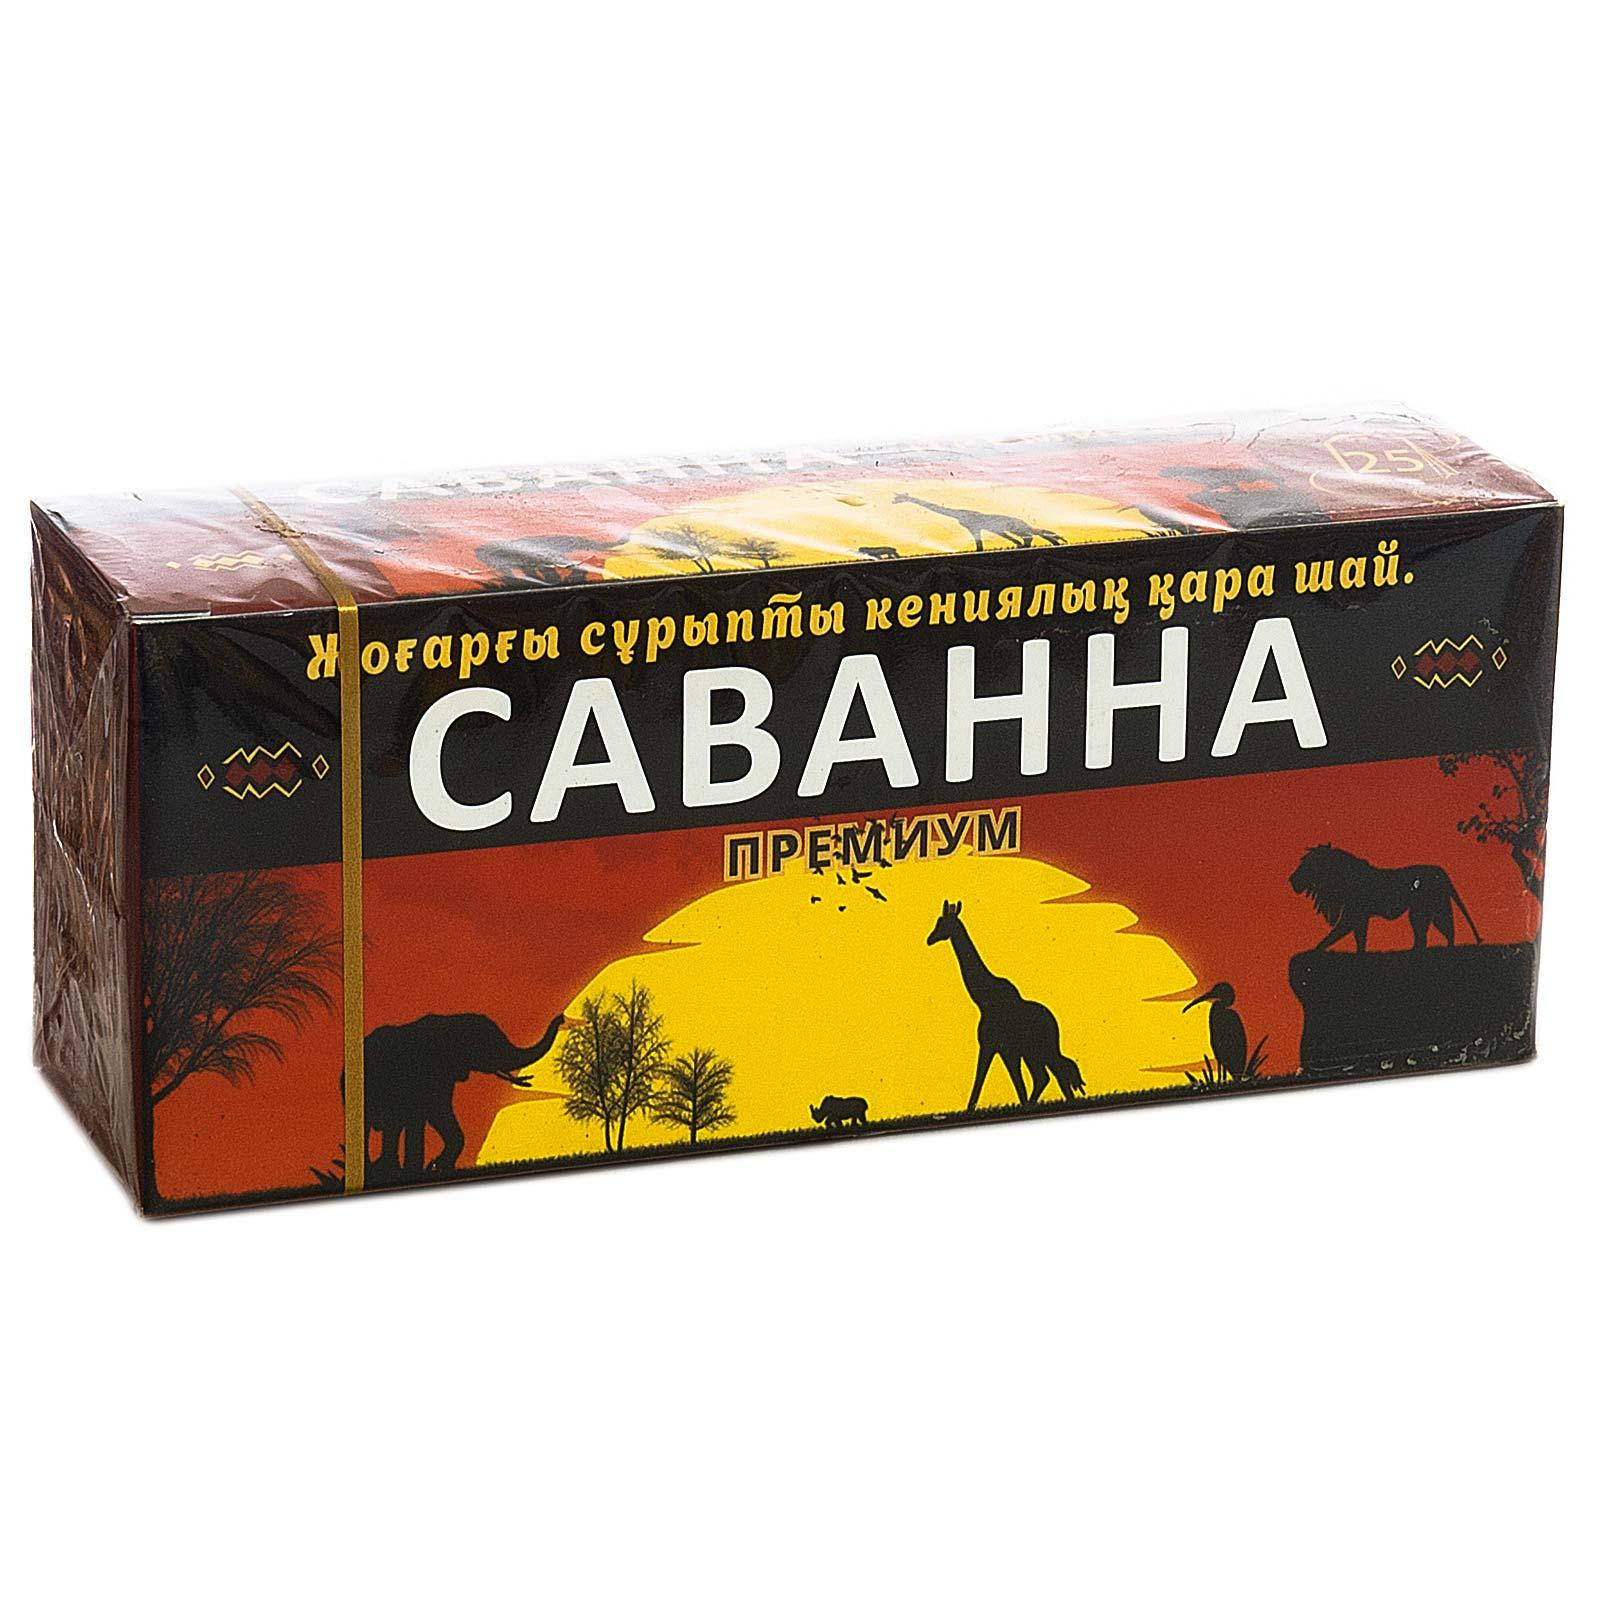 Чай Саванна Кения 25 пак